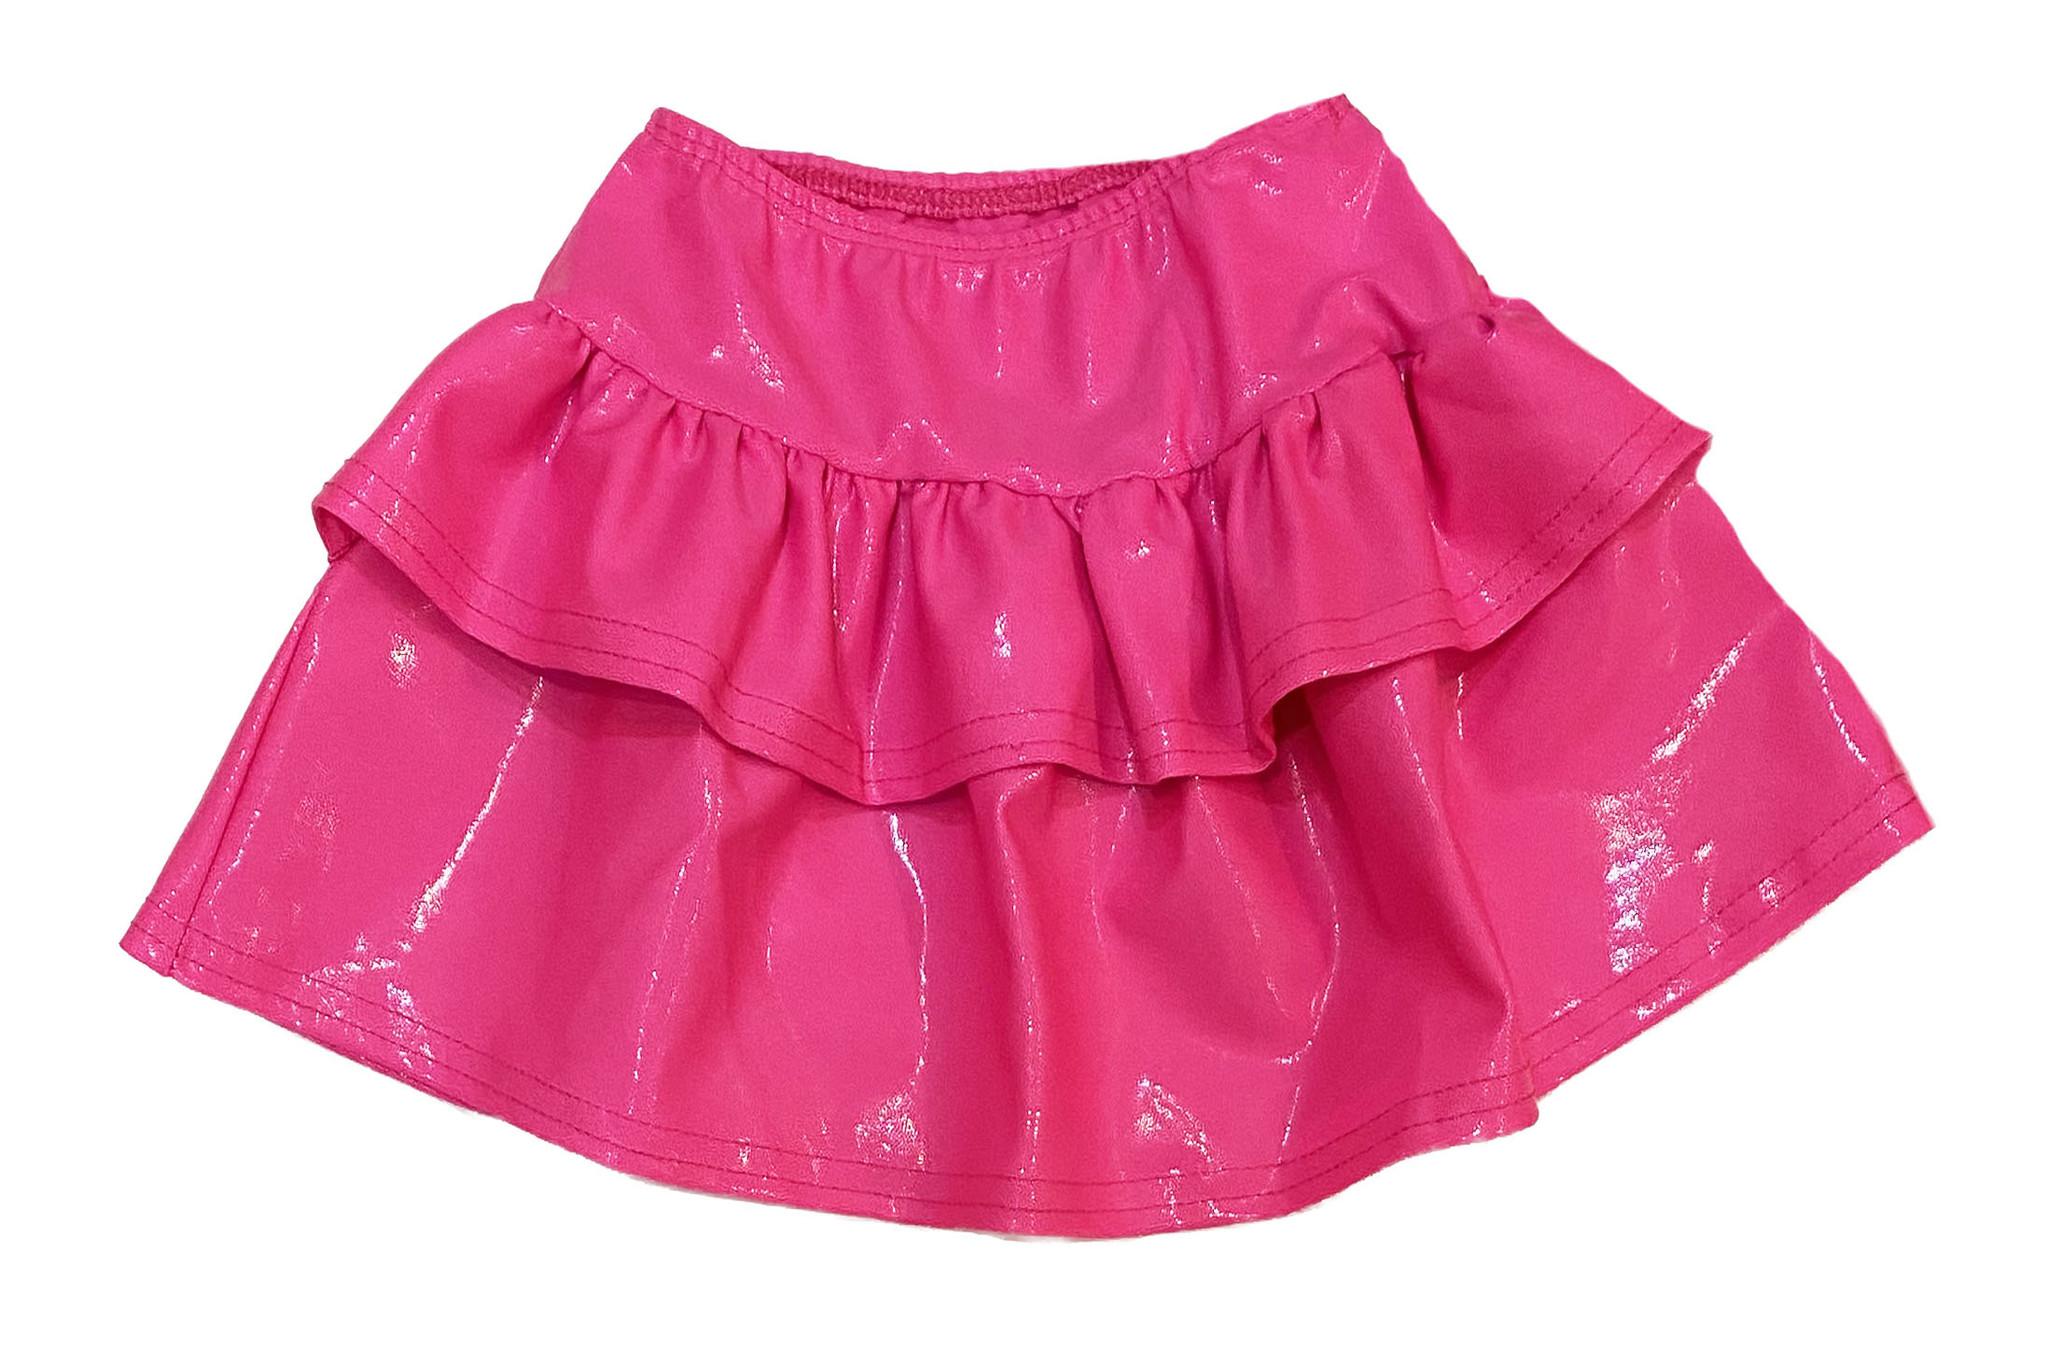 Dori Neon Pink Lame Skirt